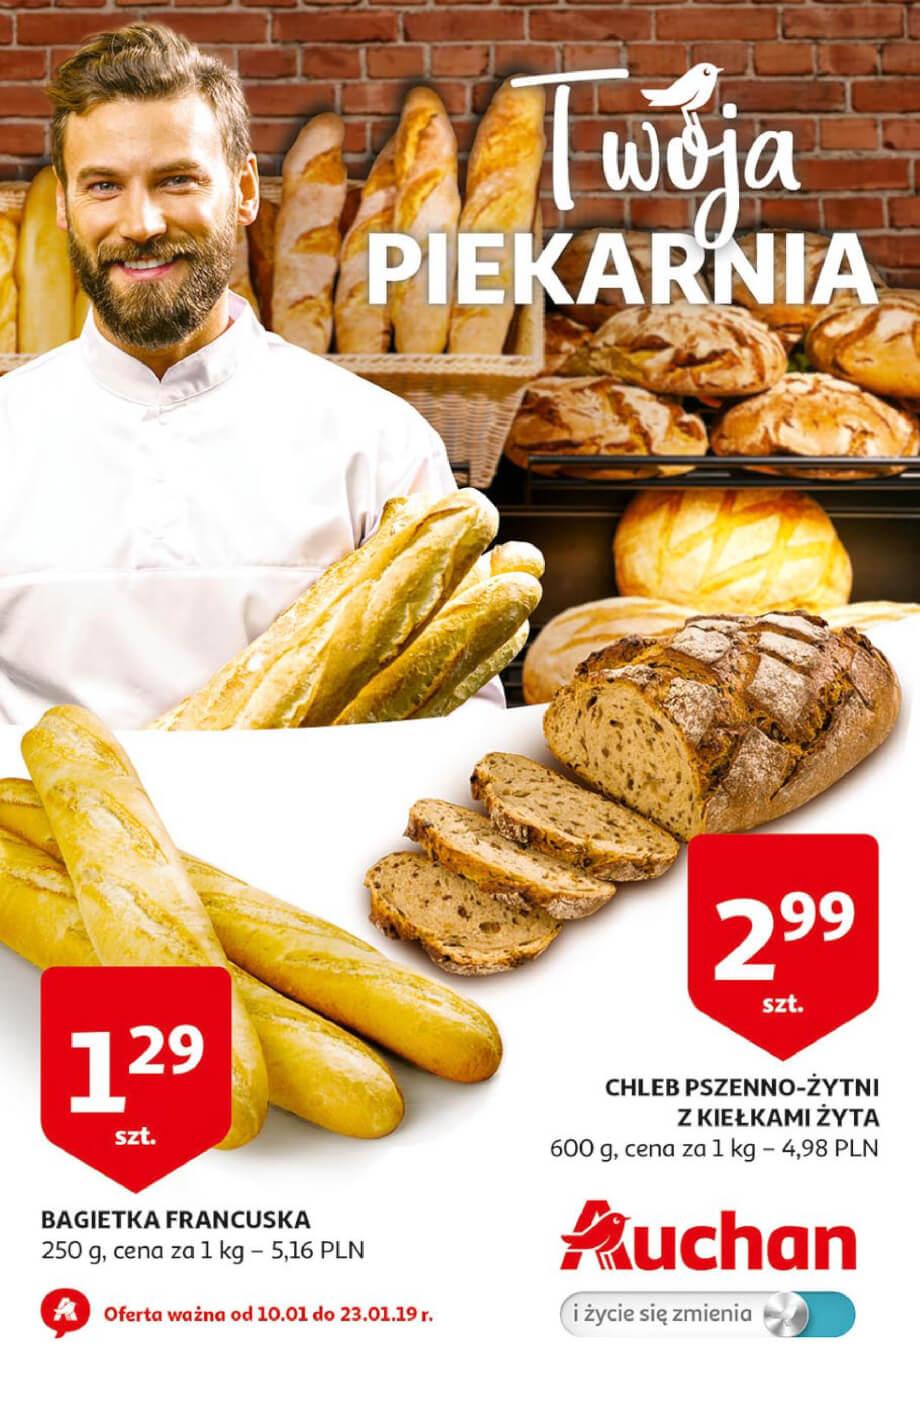 Auchan, gazetka do 23.01.2019